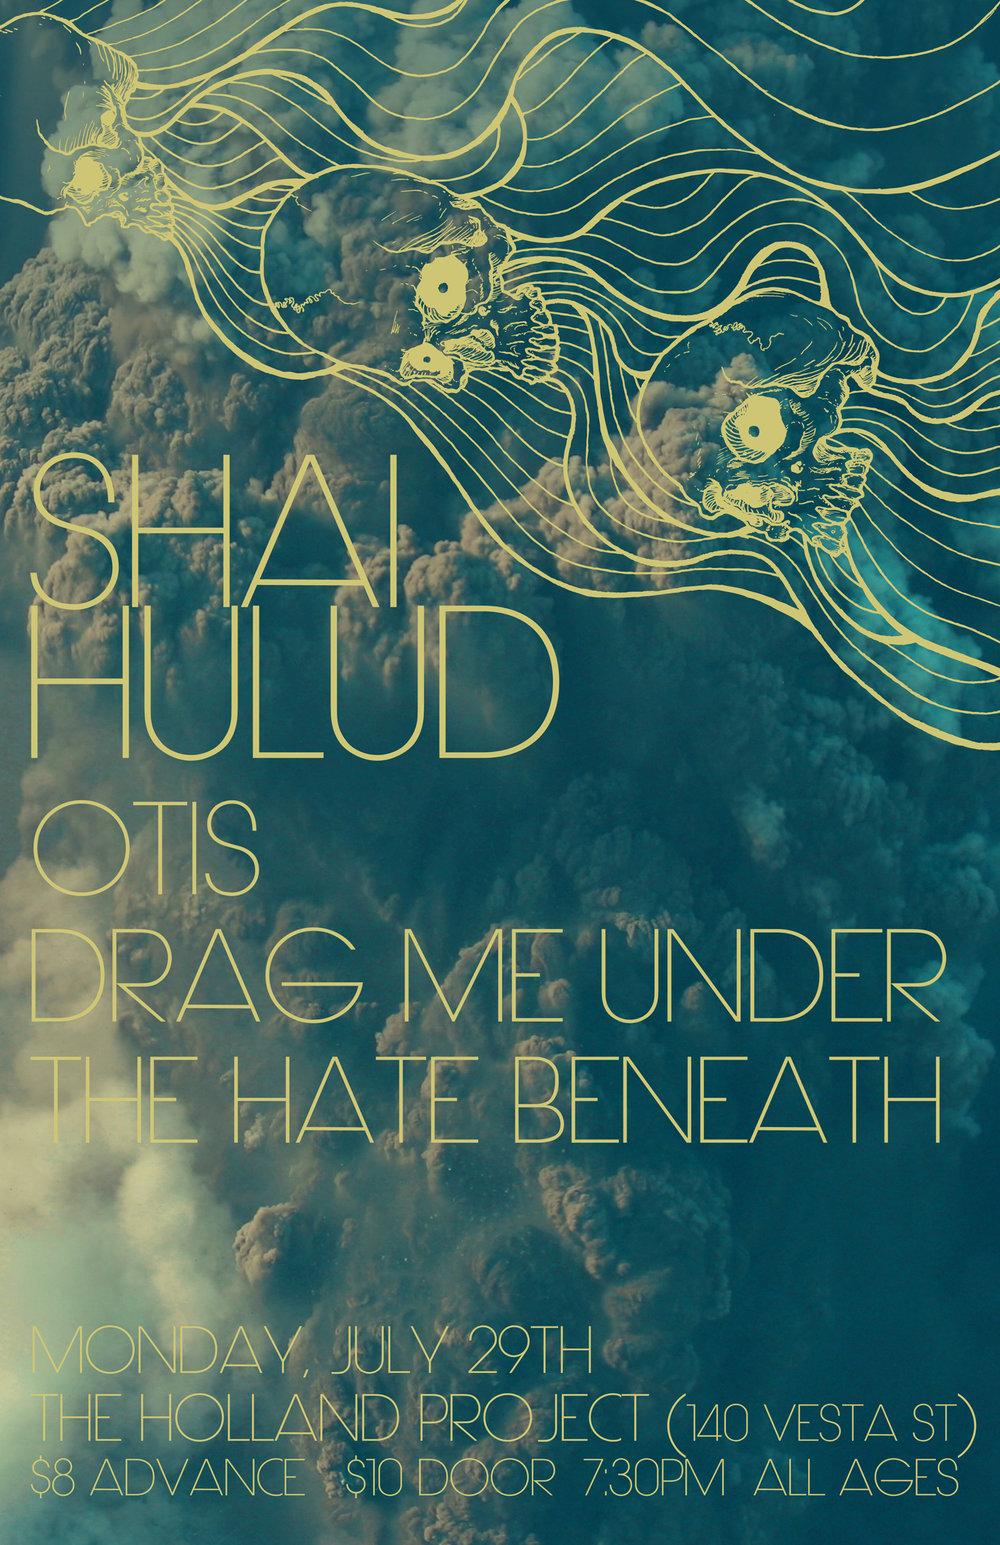 Shai Hulud 2013 2 site.jpg